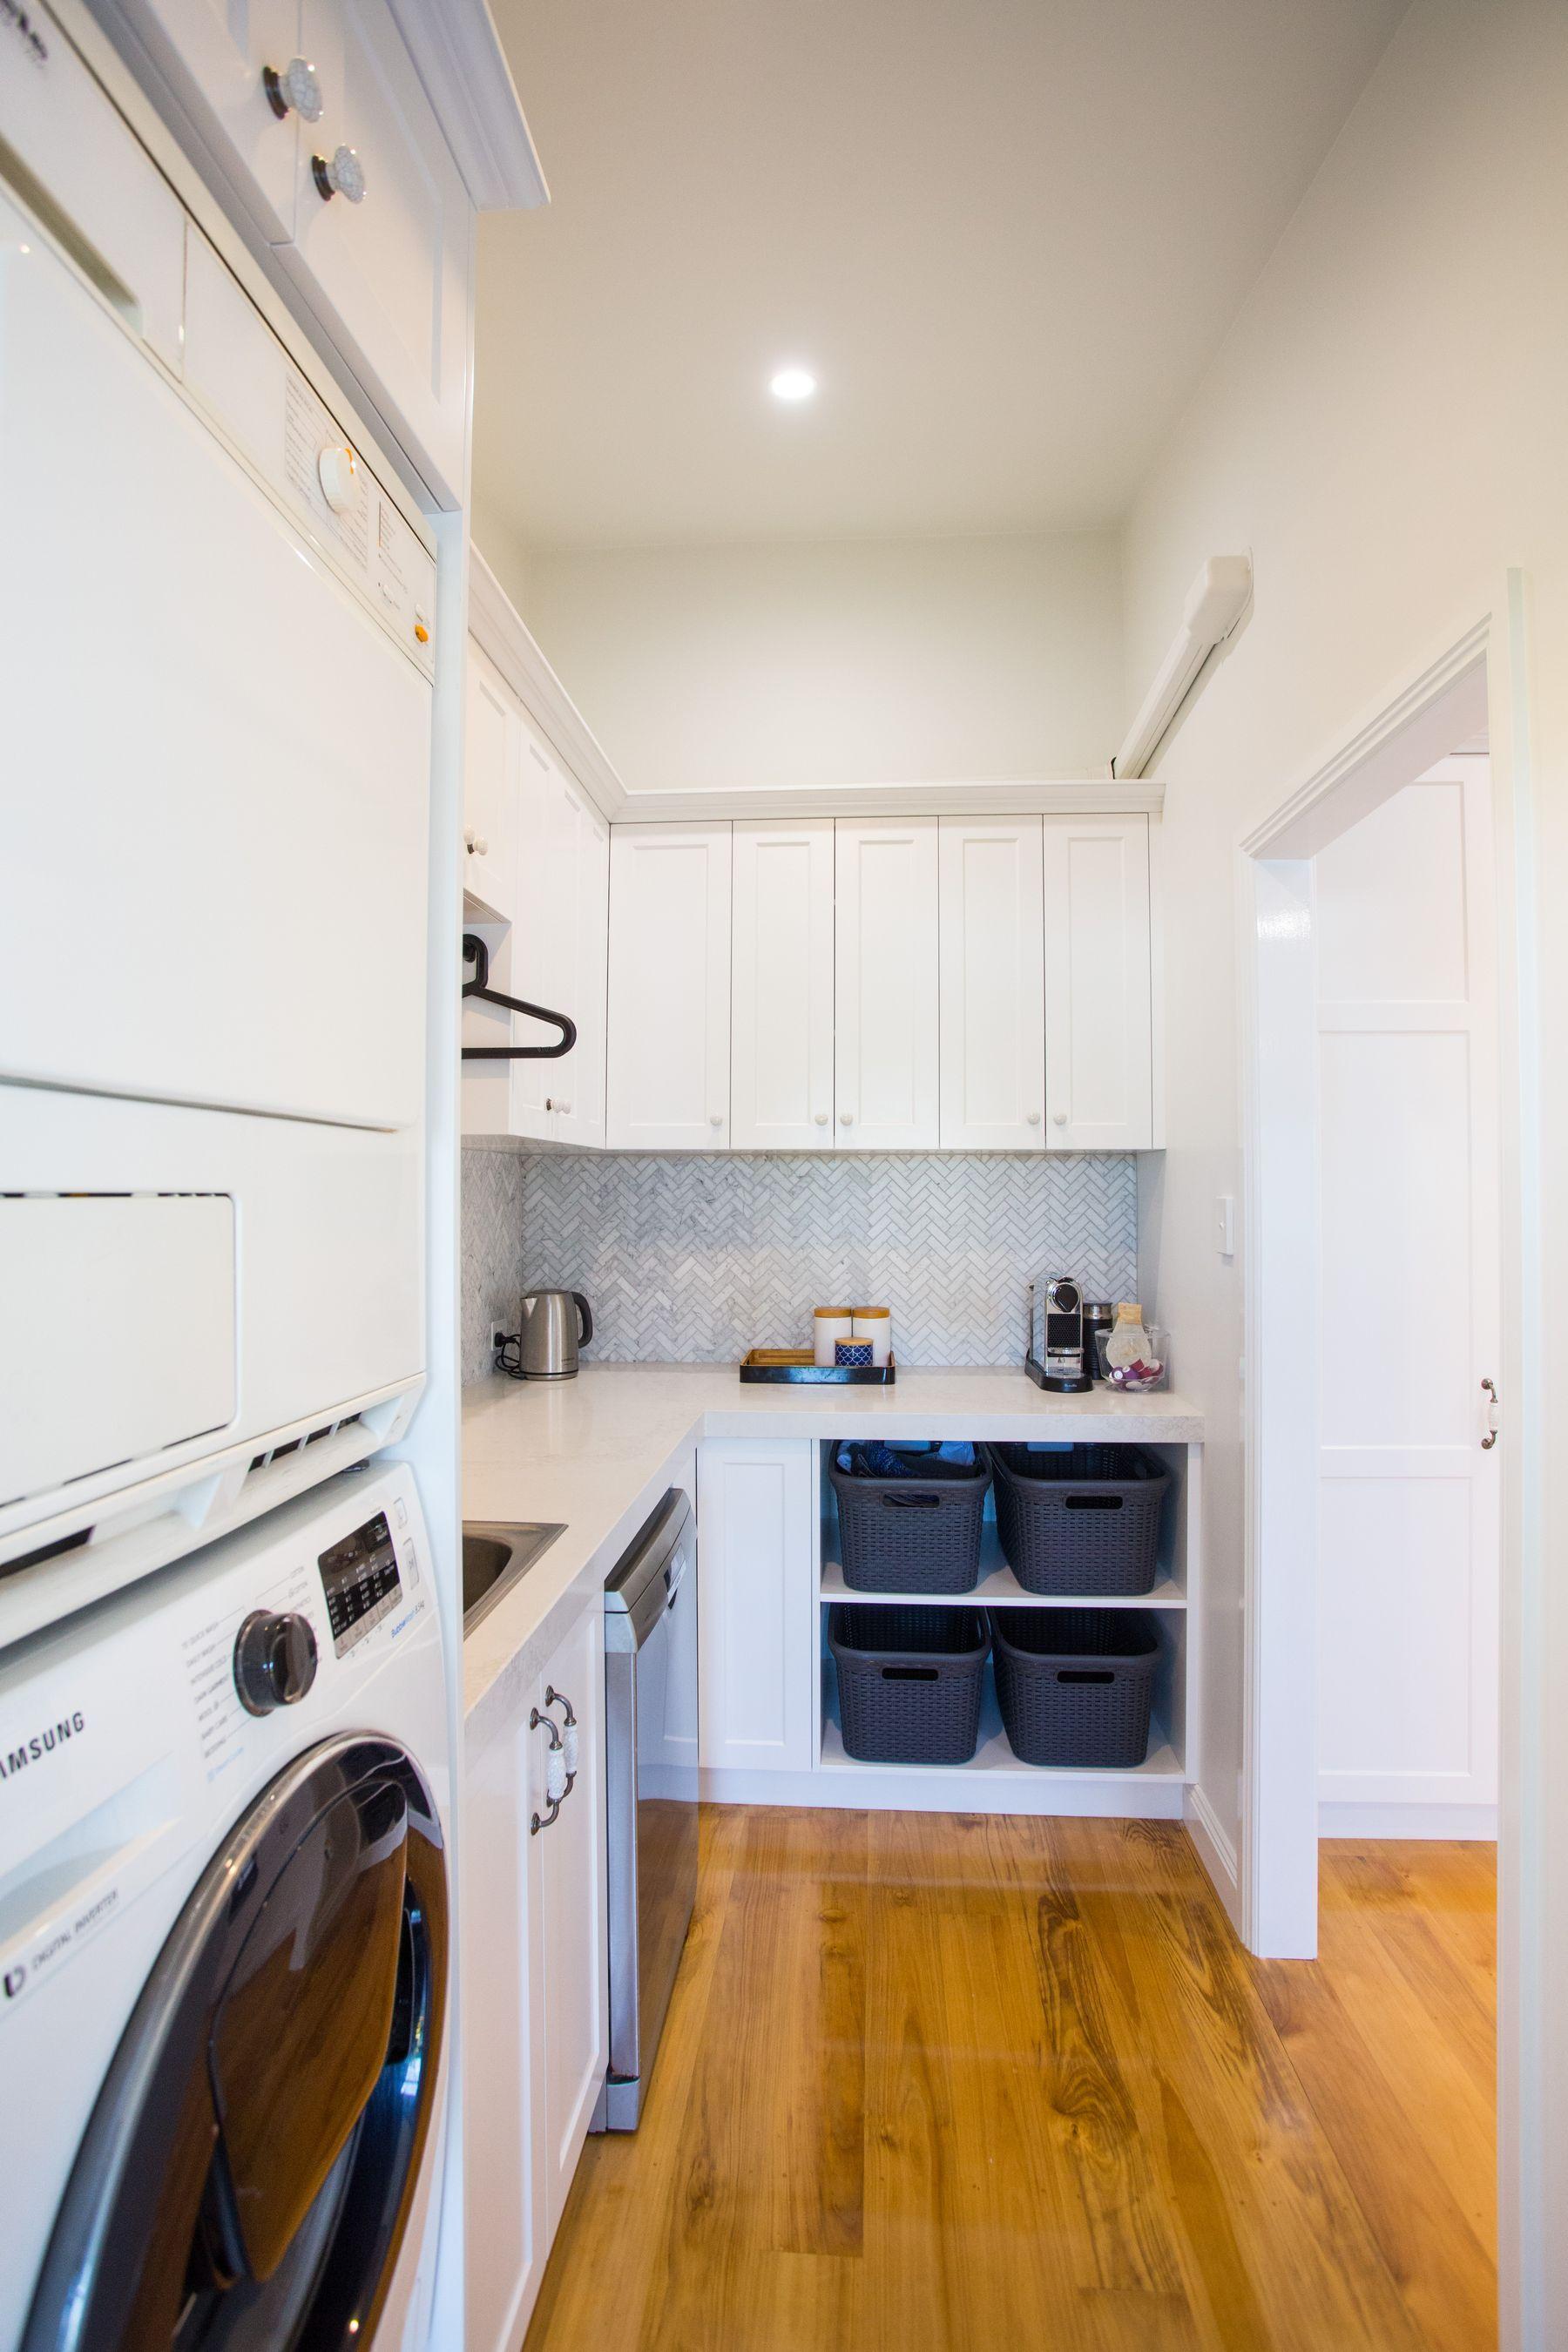 Https Www Makingsfinekitchens Com Au Wp Content Uploads 2019 07 036 Jpg Kitchen Pantry Design Pantry Laundry Pantry Laundry Room